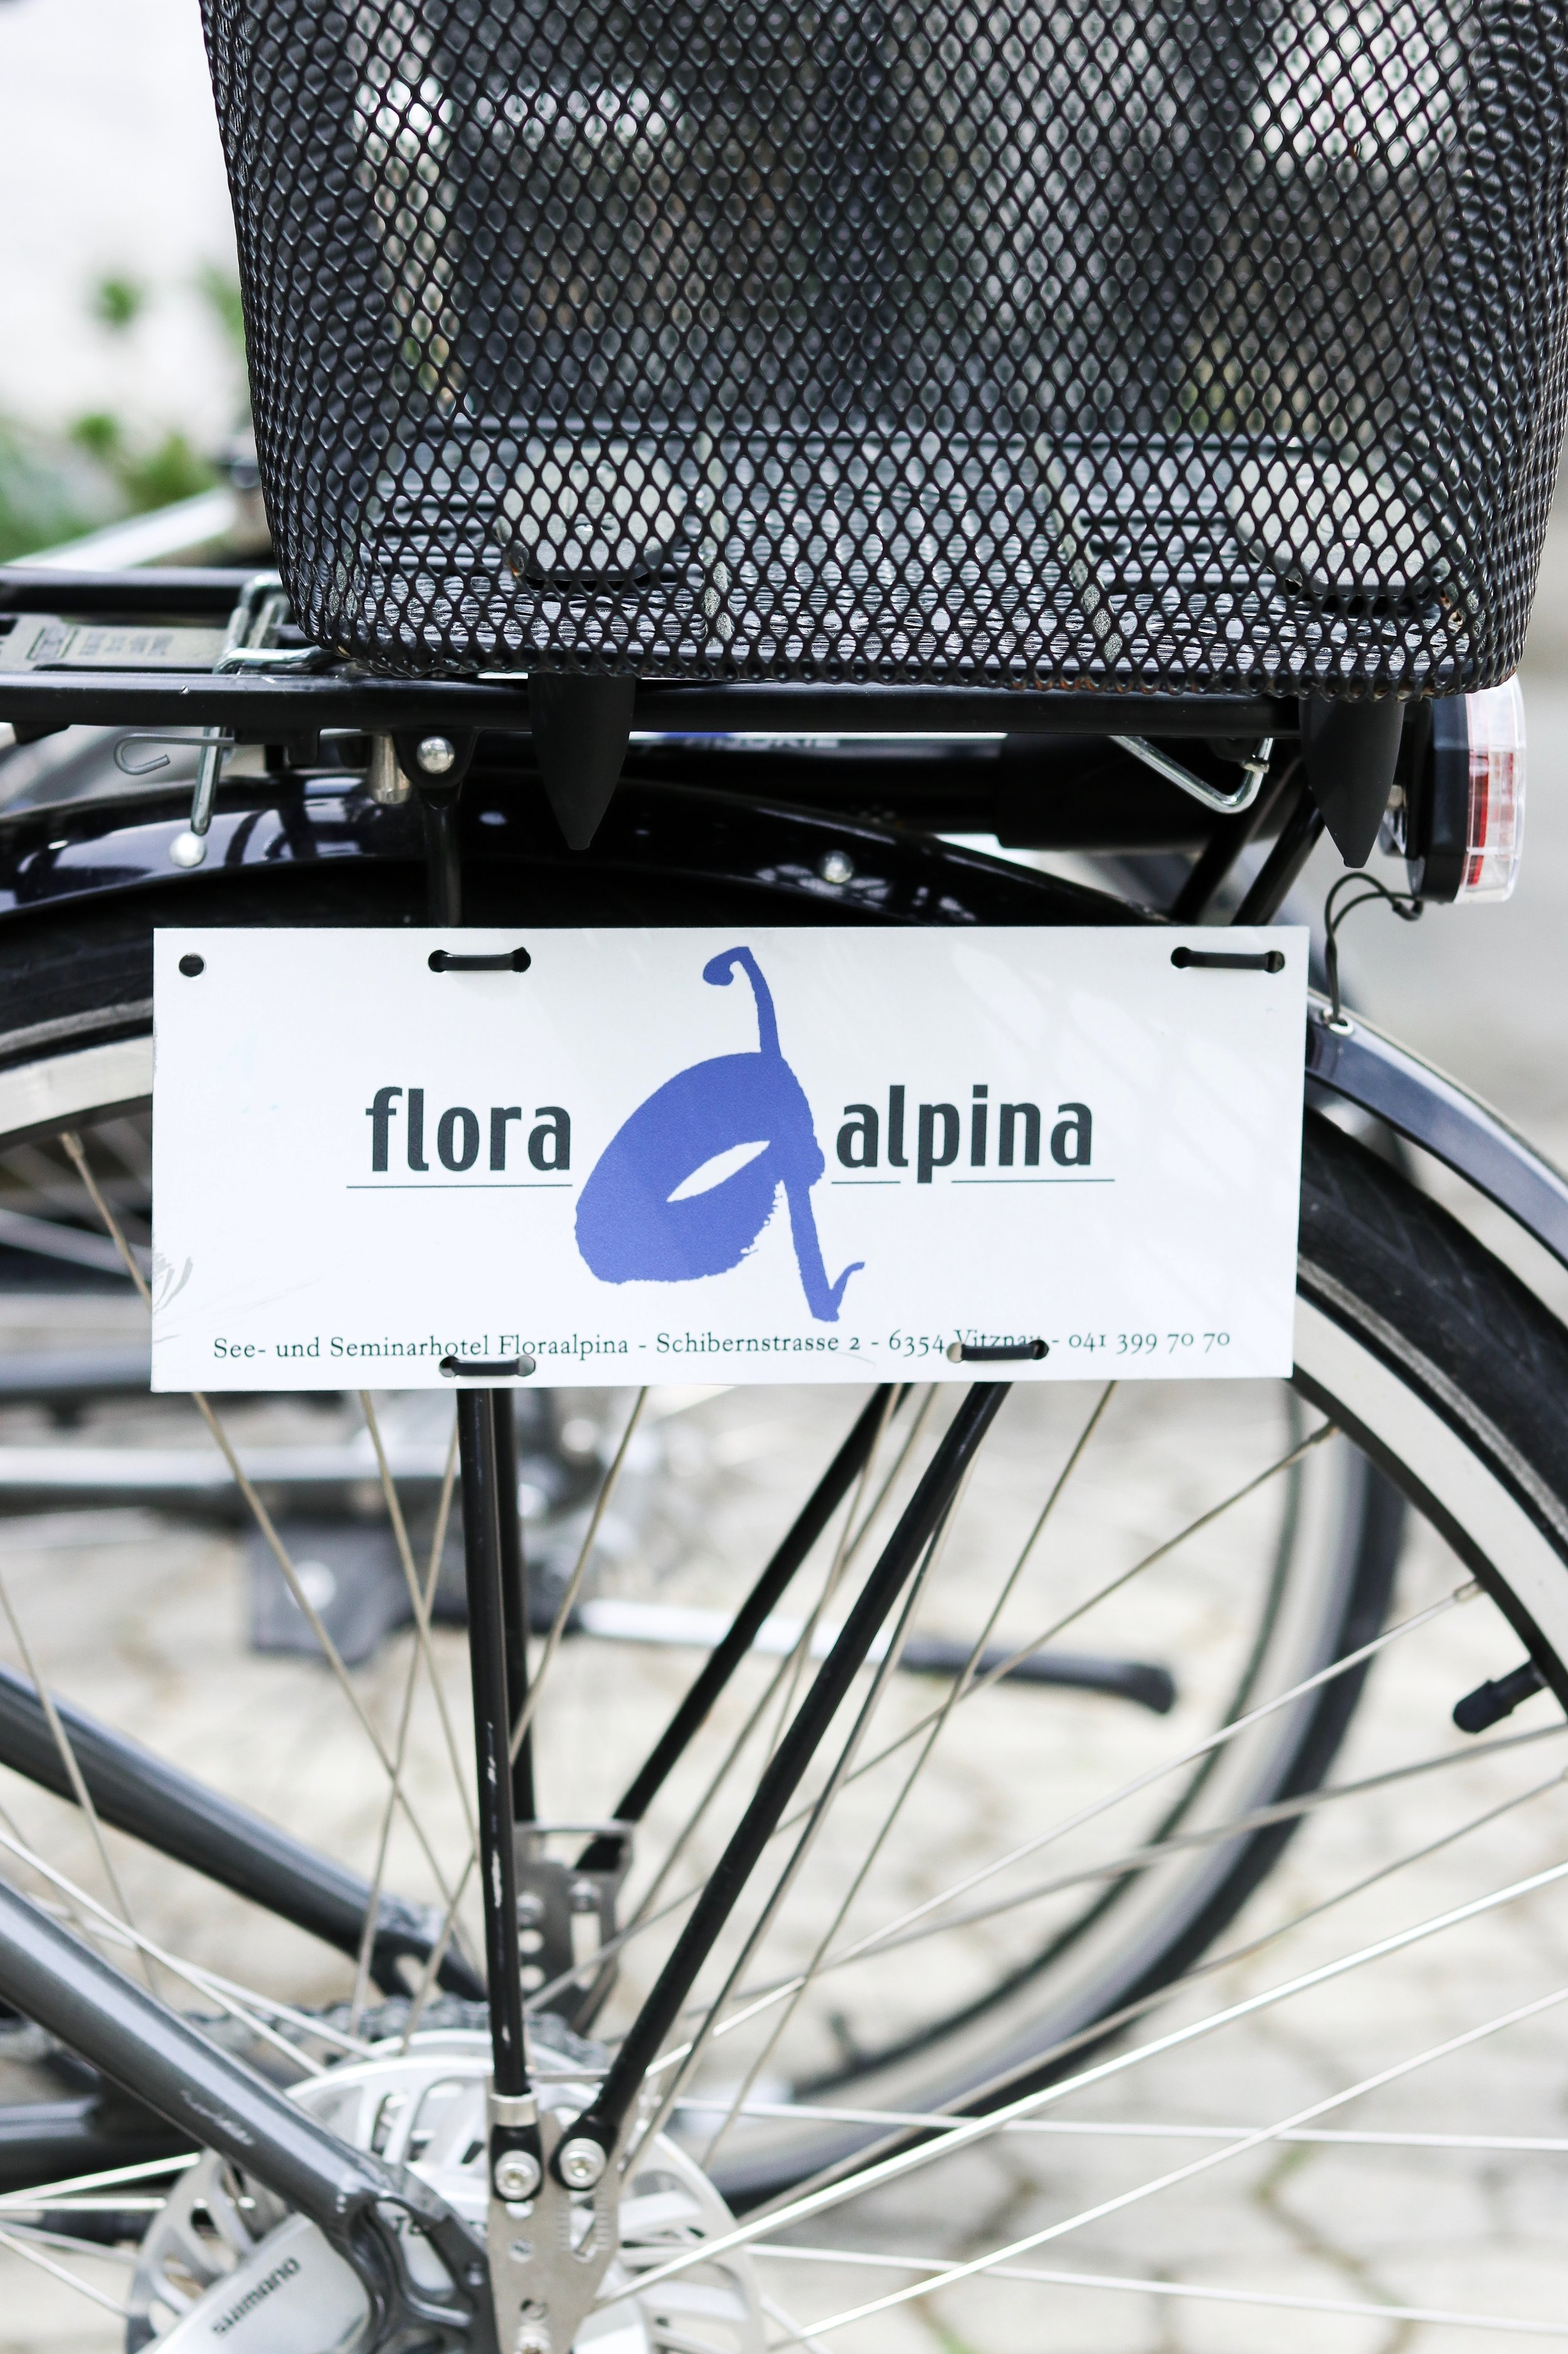 Luzern isst - FloraAlpina